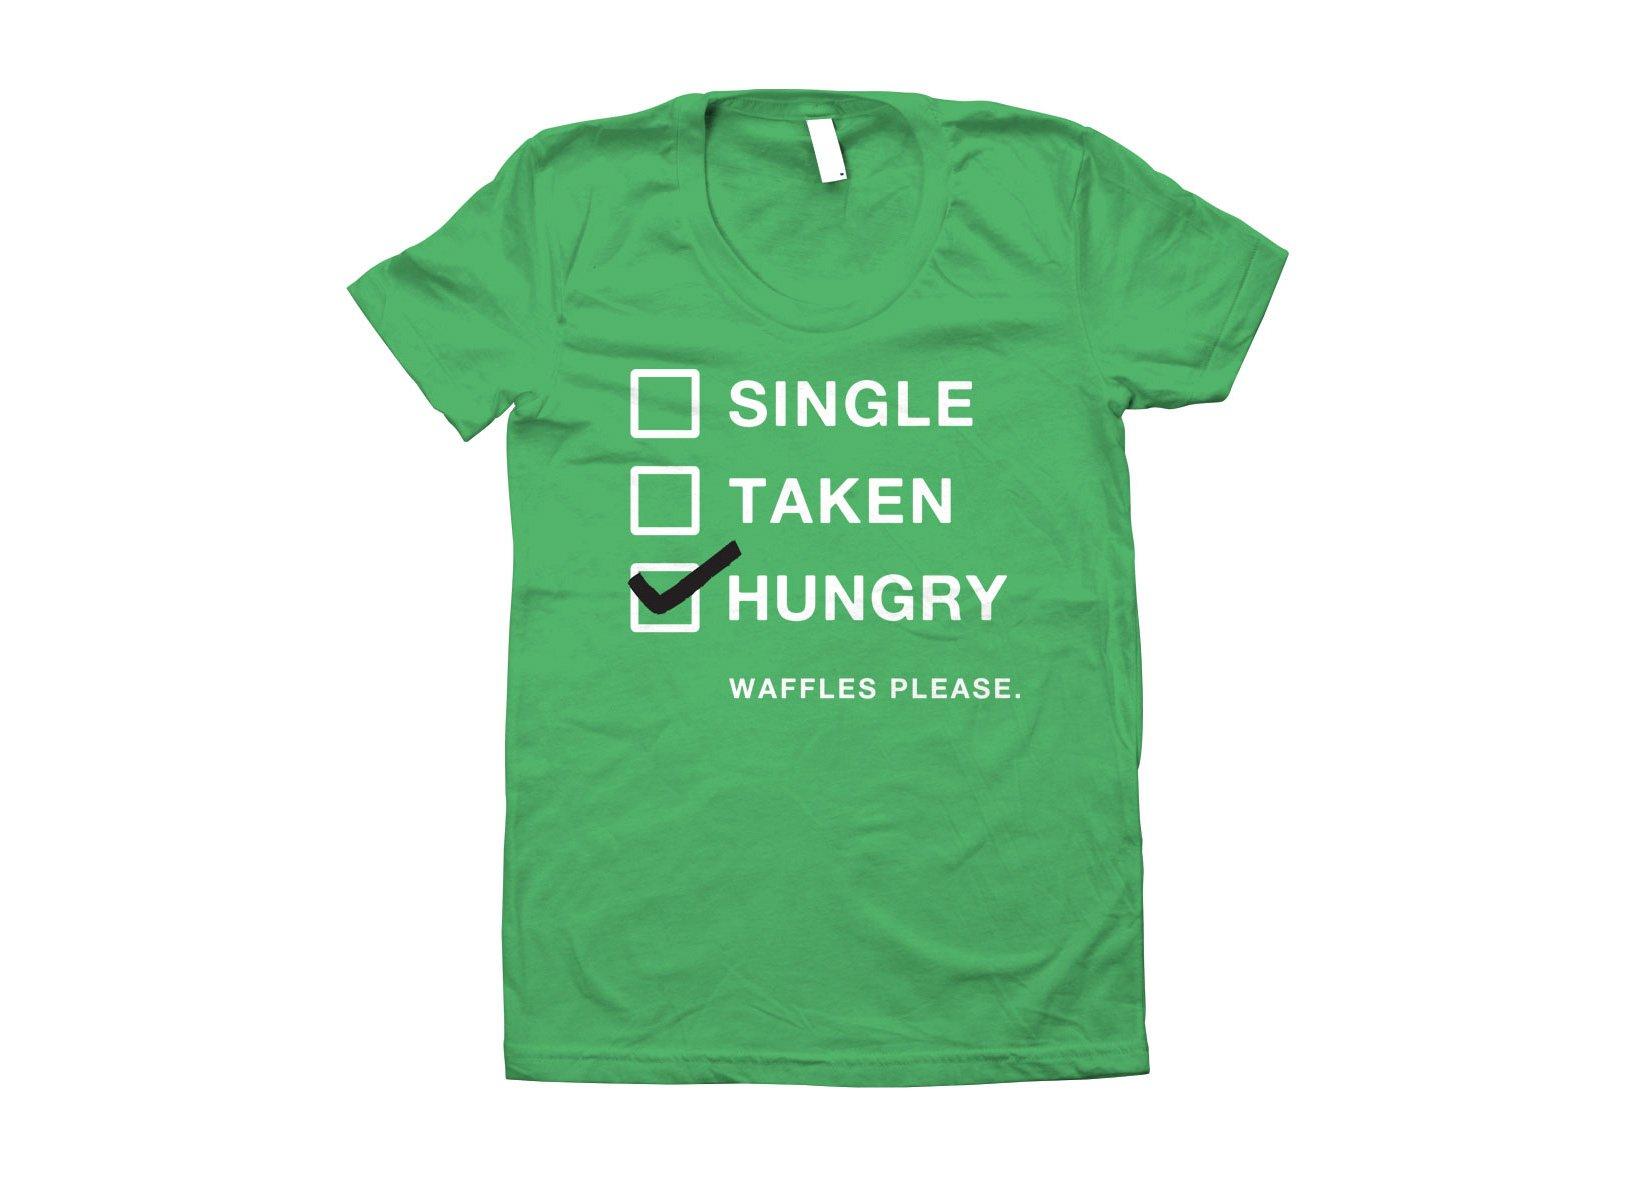 Single, Taken, Hungry T-Shirt | SnorgTees